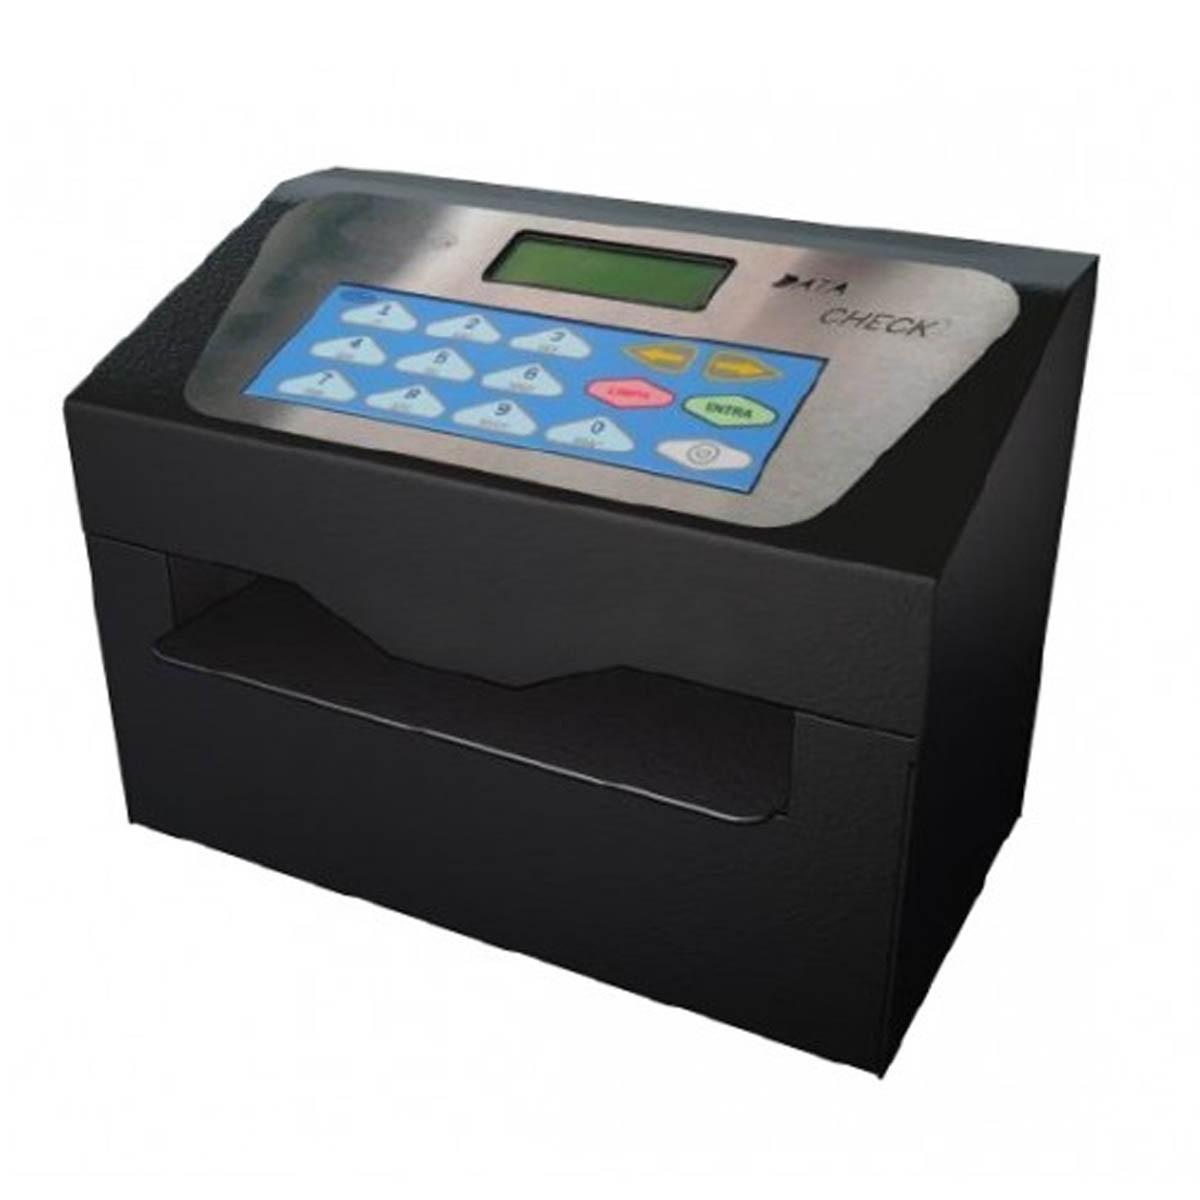 Impressora de Cheques Datacheck -  Menno